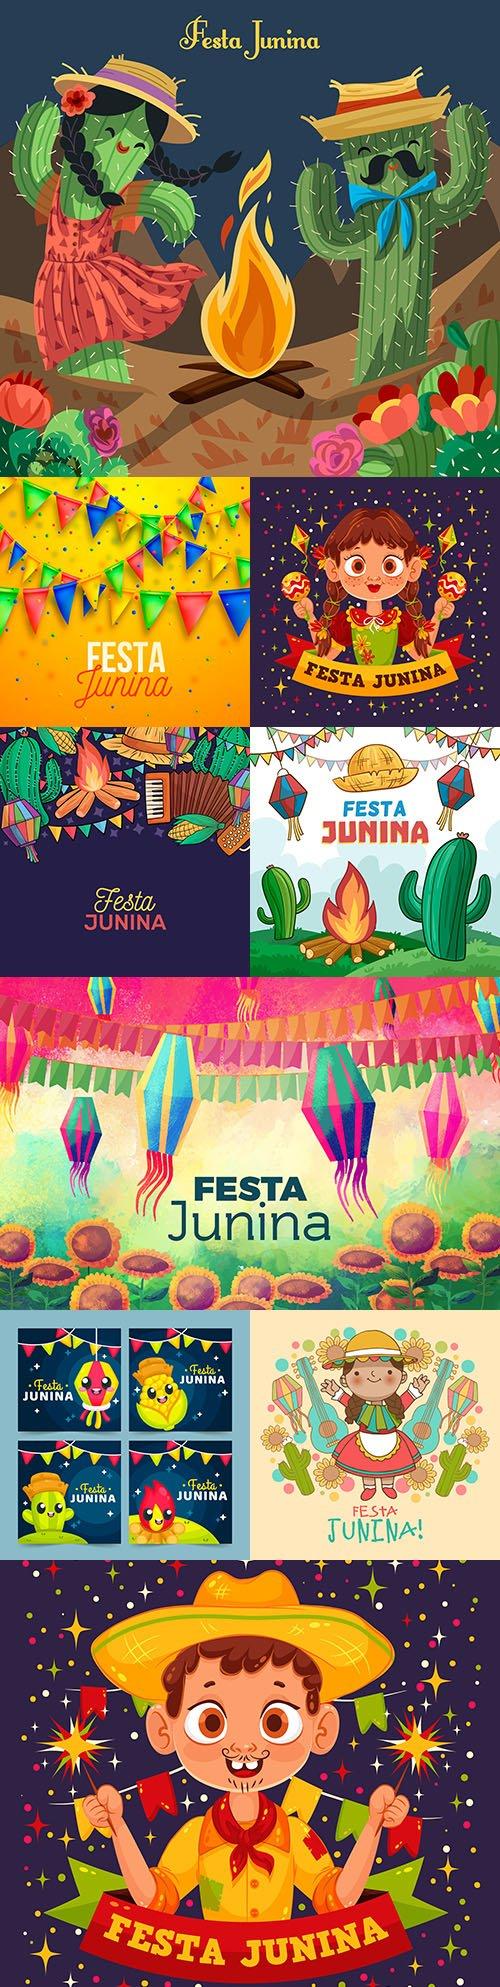 Festa Junina celebration drawn illustrations backgrounds